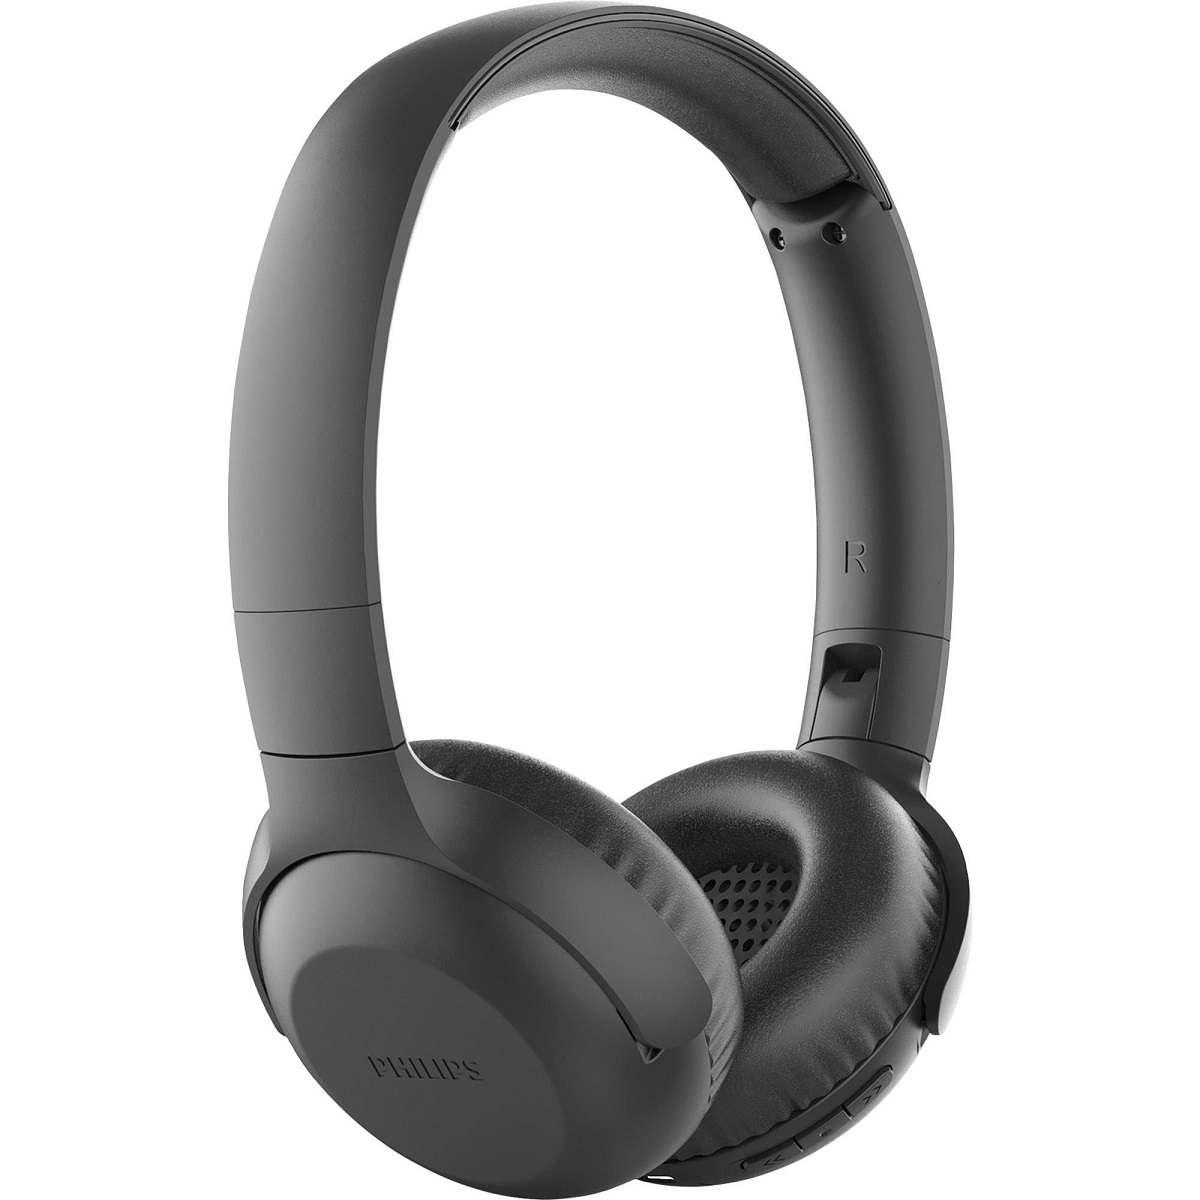 Fone De Ouvido Bluetooth Philips TAUH202BK/00 Preto com Microfone